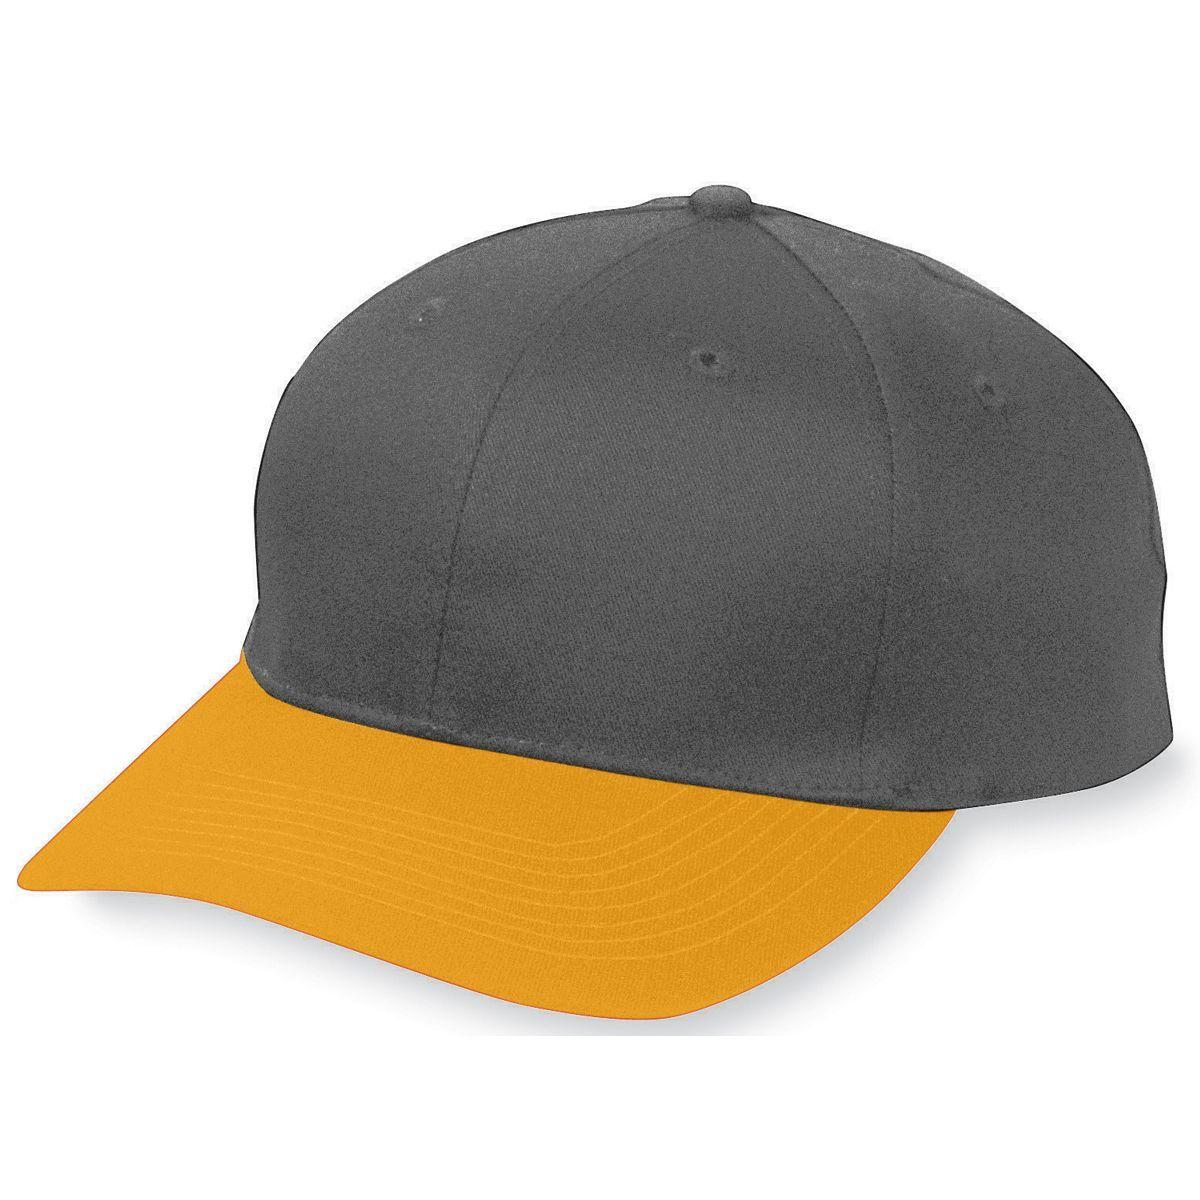 Six-Panel Cotton Twill Low-Profile Cap - BLACK/GOLD